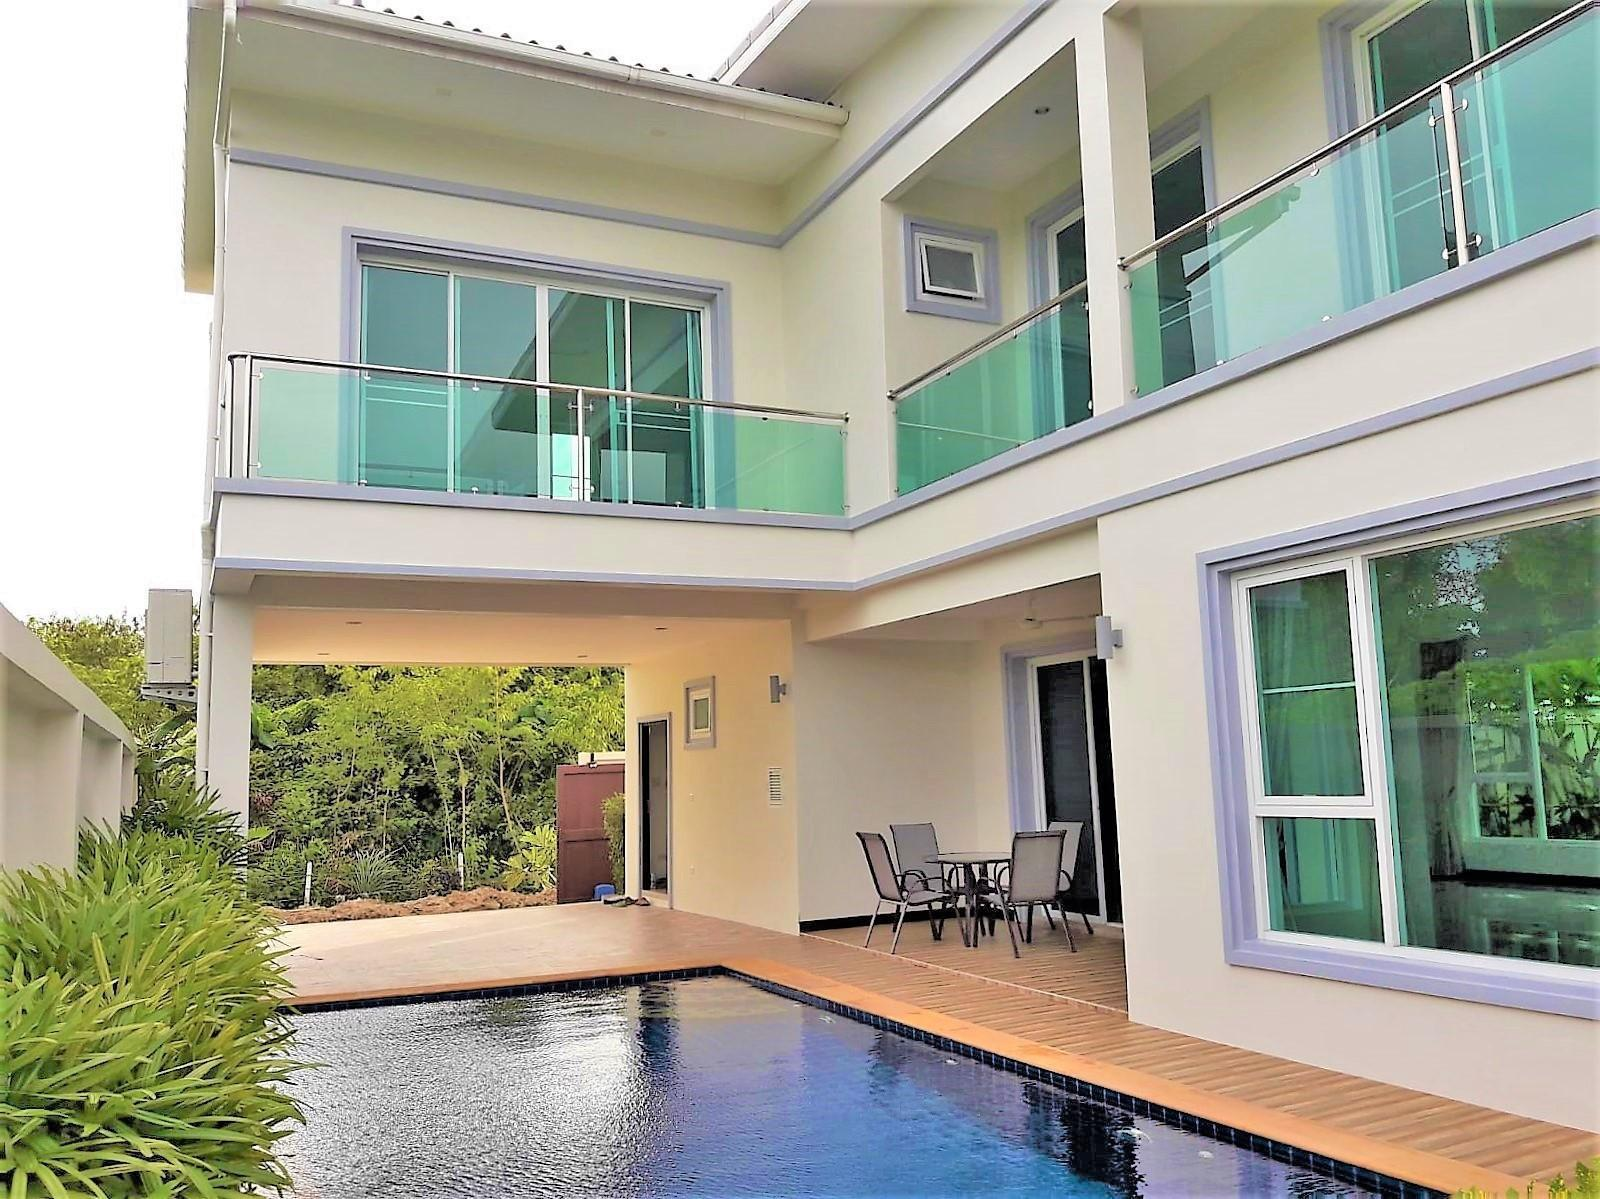 Pool Villa Rawai by PHR วิลลา 3 ห้องนอน 4 ห้องน้ำส่วนตัว ขนาด 350 ตร.ม. – หาดราไวย์